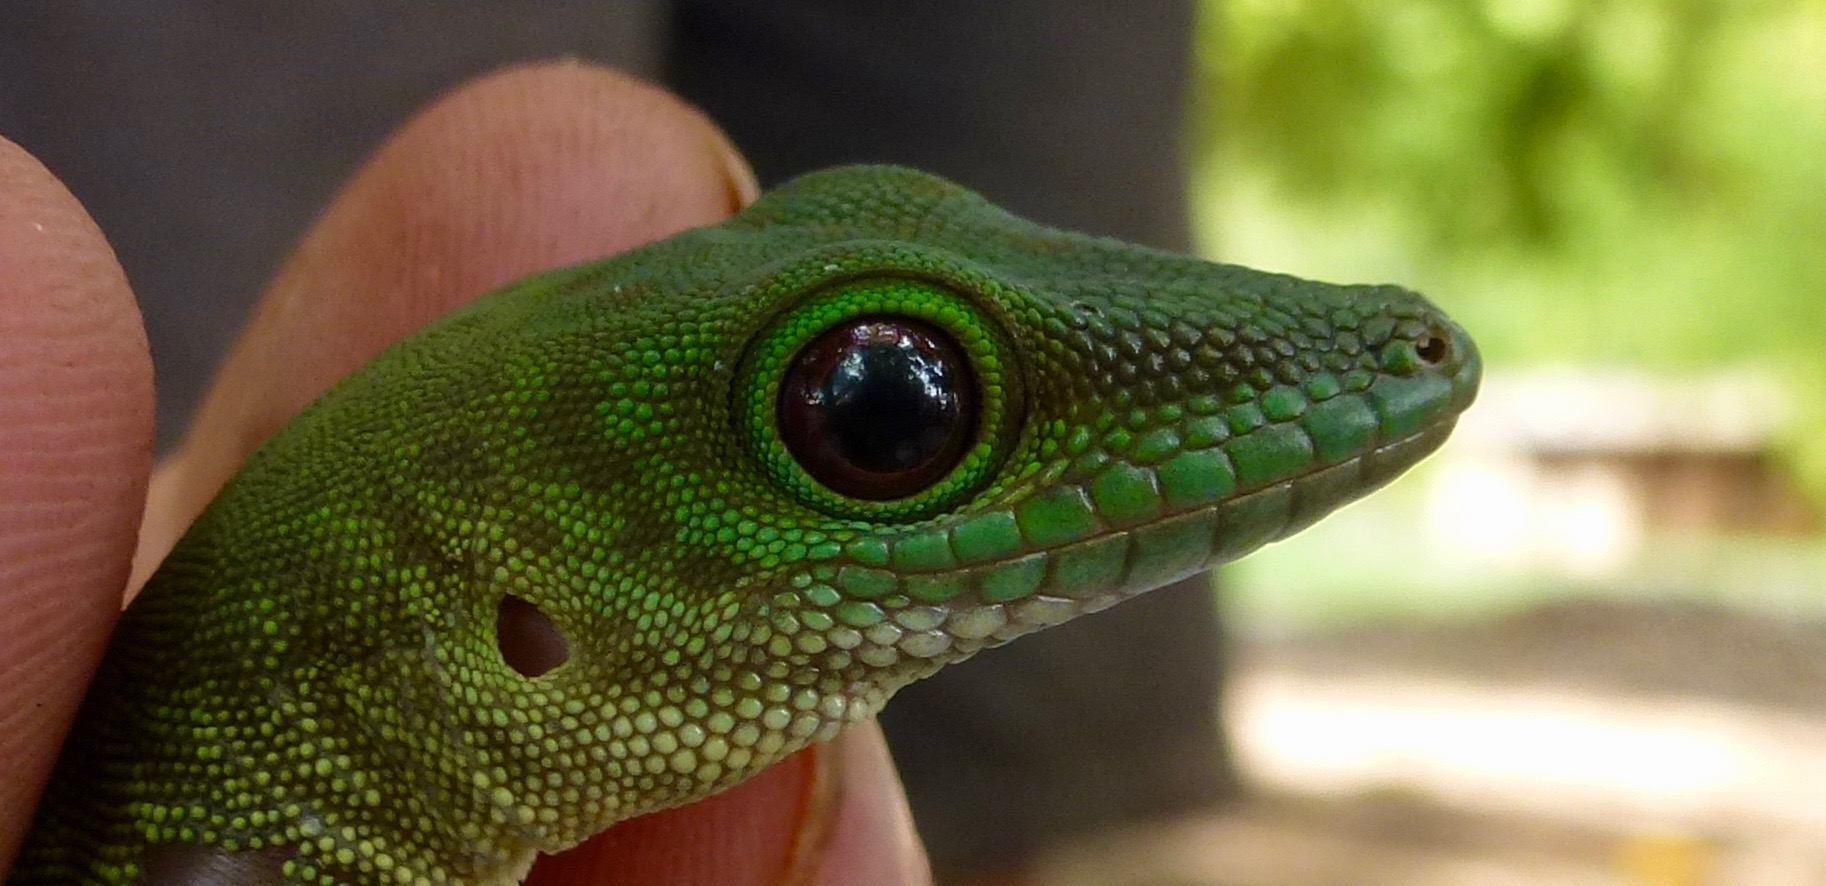 Giant Day Gecko,  Phelsuma madagascariensis . One two species of phelsuma seen here.